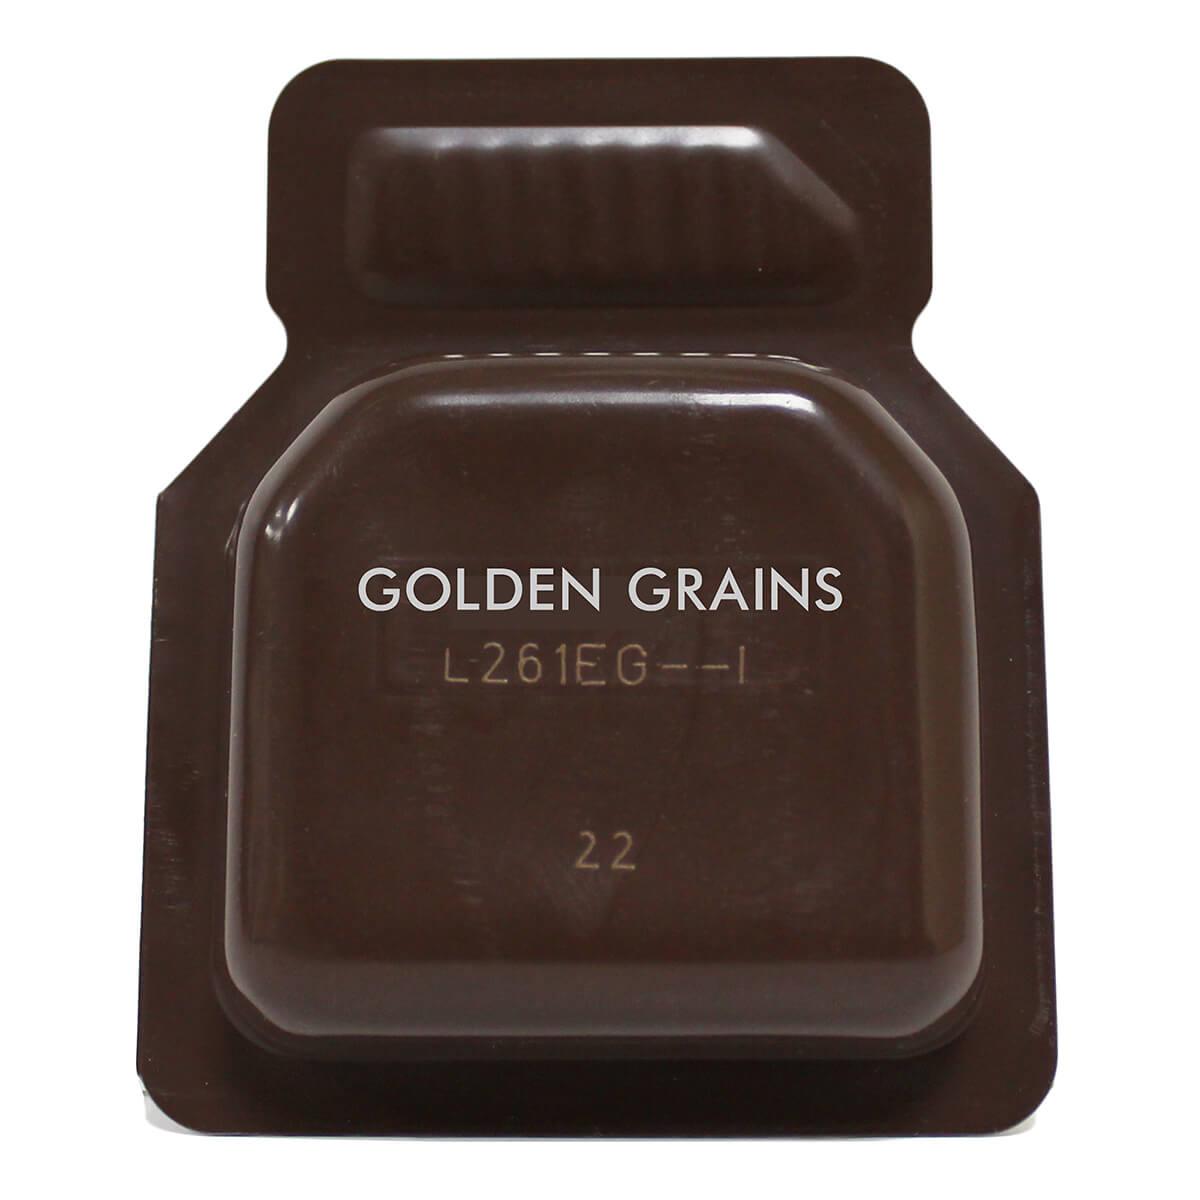 Golden Grains Dubai Export - Nutella Mini - Back.jpg